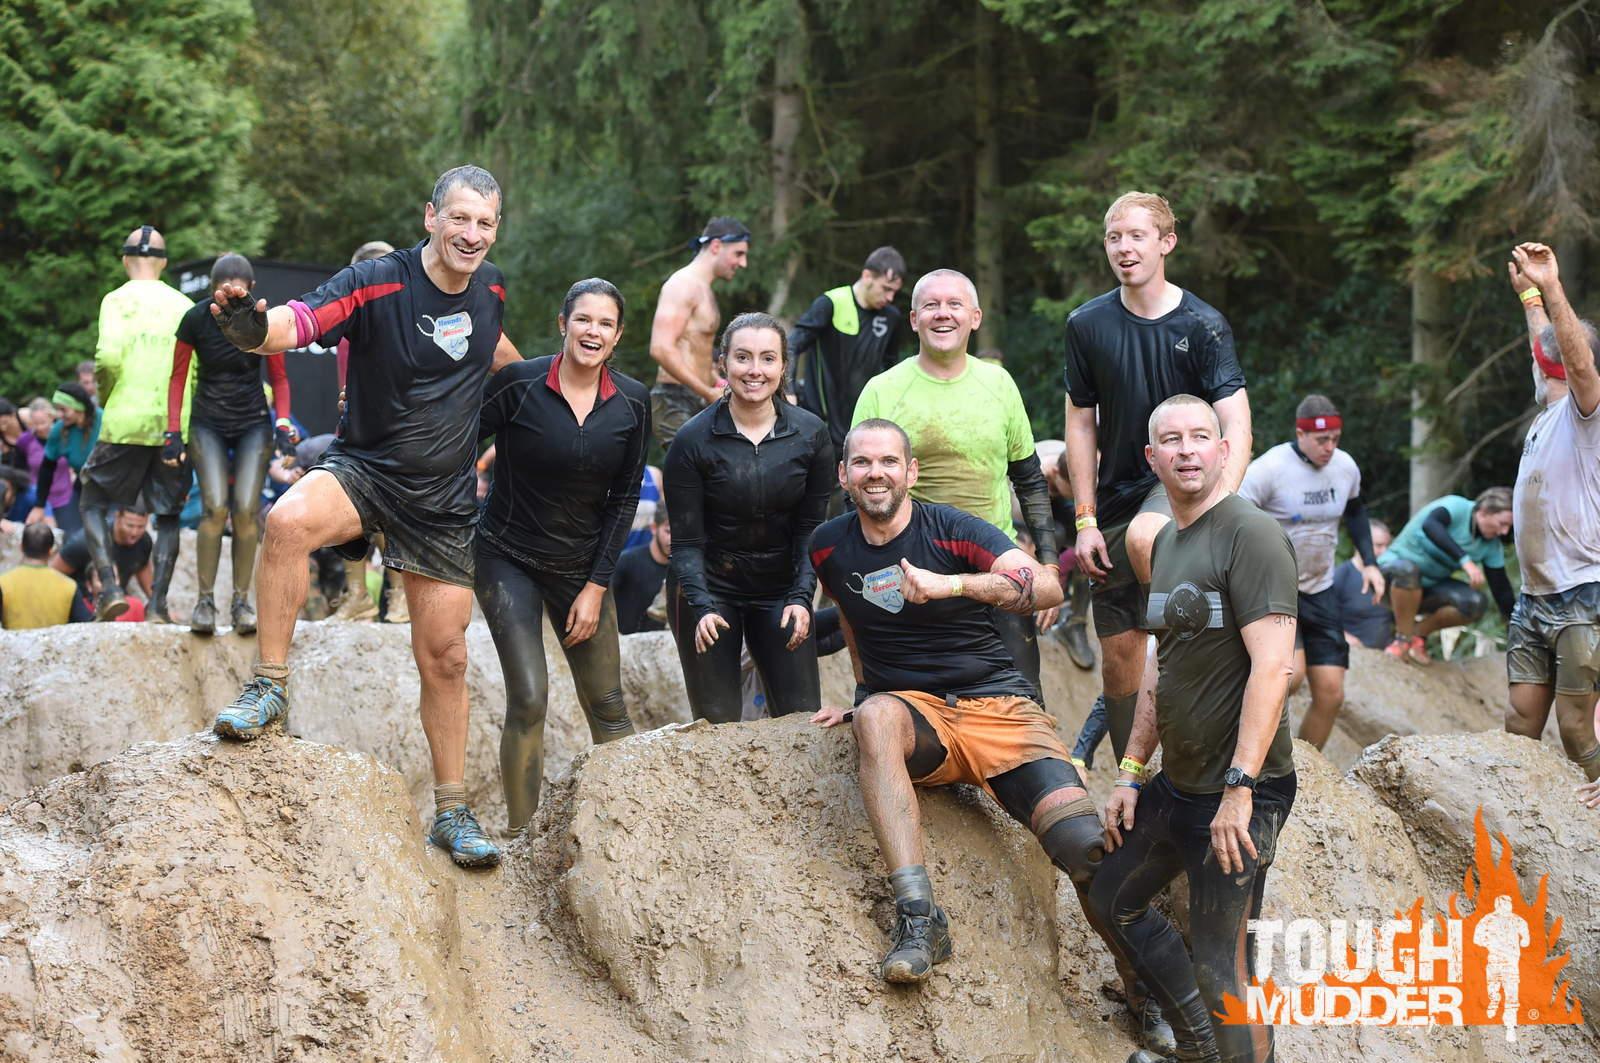 The Aquila Tough Mudder Team, from left to right, Kelvin Richardson, Nicola Denbigh, Emily Makepeace, Chris Brearley, David Hawken, Matt Woods and Jonathon Dudley.